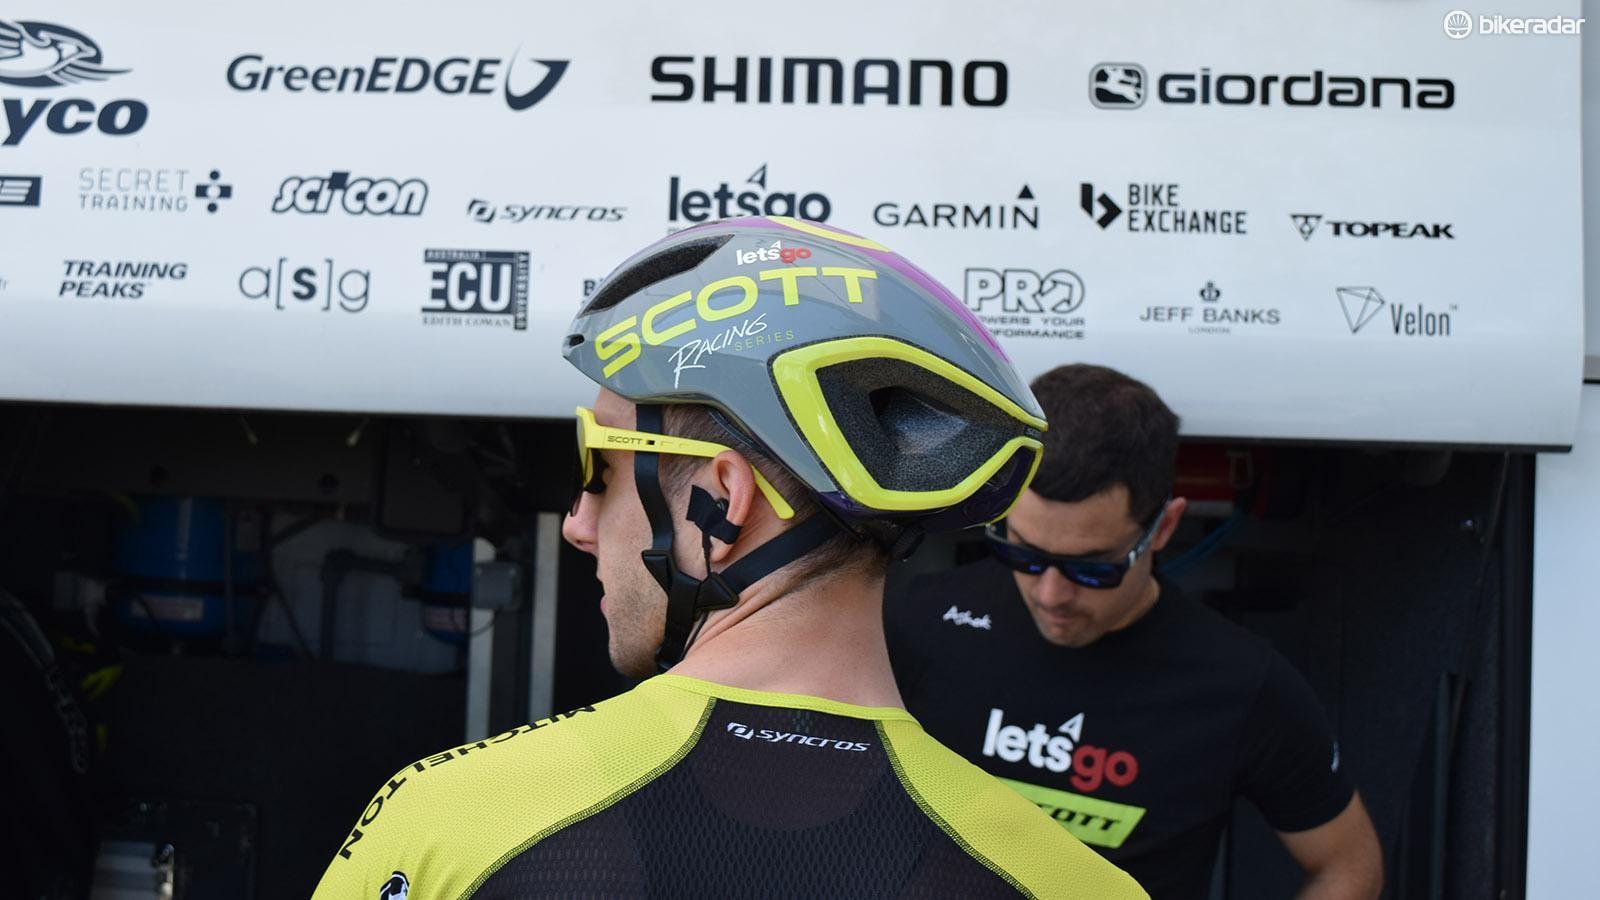 The helmets feature retro Scott decals